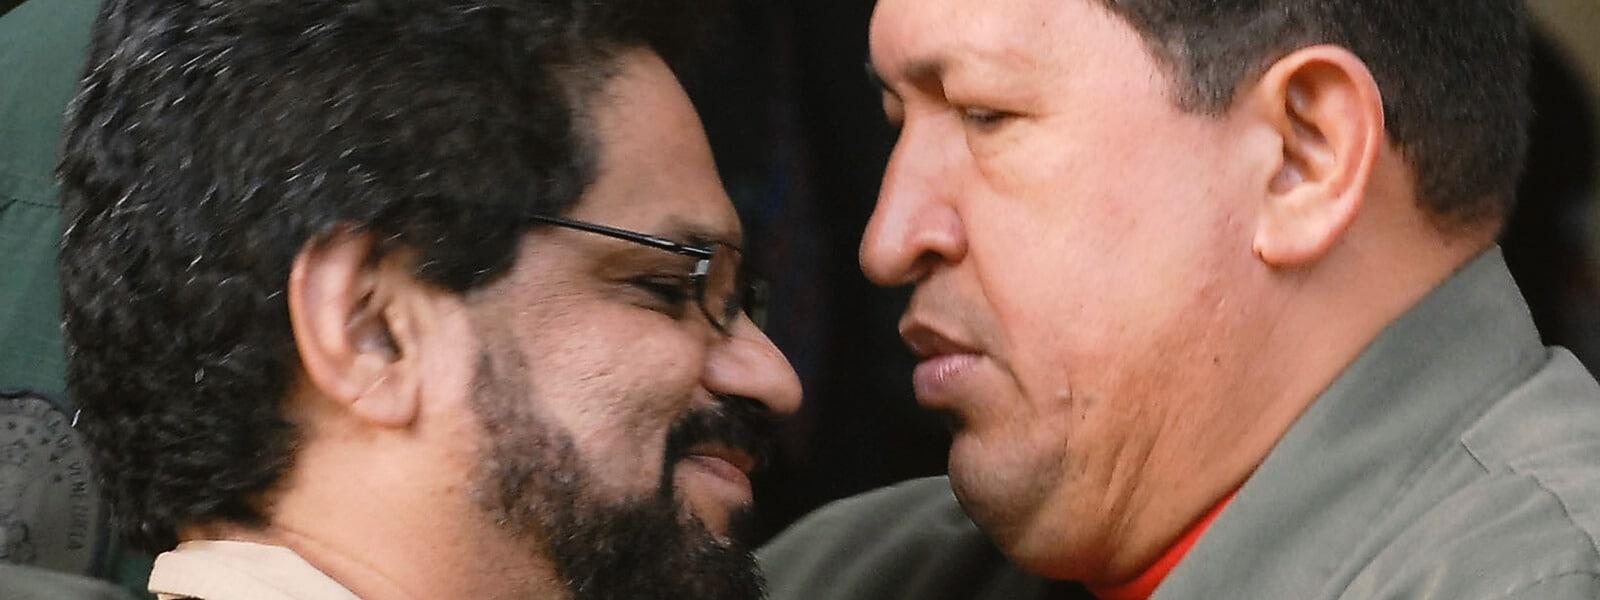 Ex-FARC Mafia, Venezuela and the Current International Climate